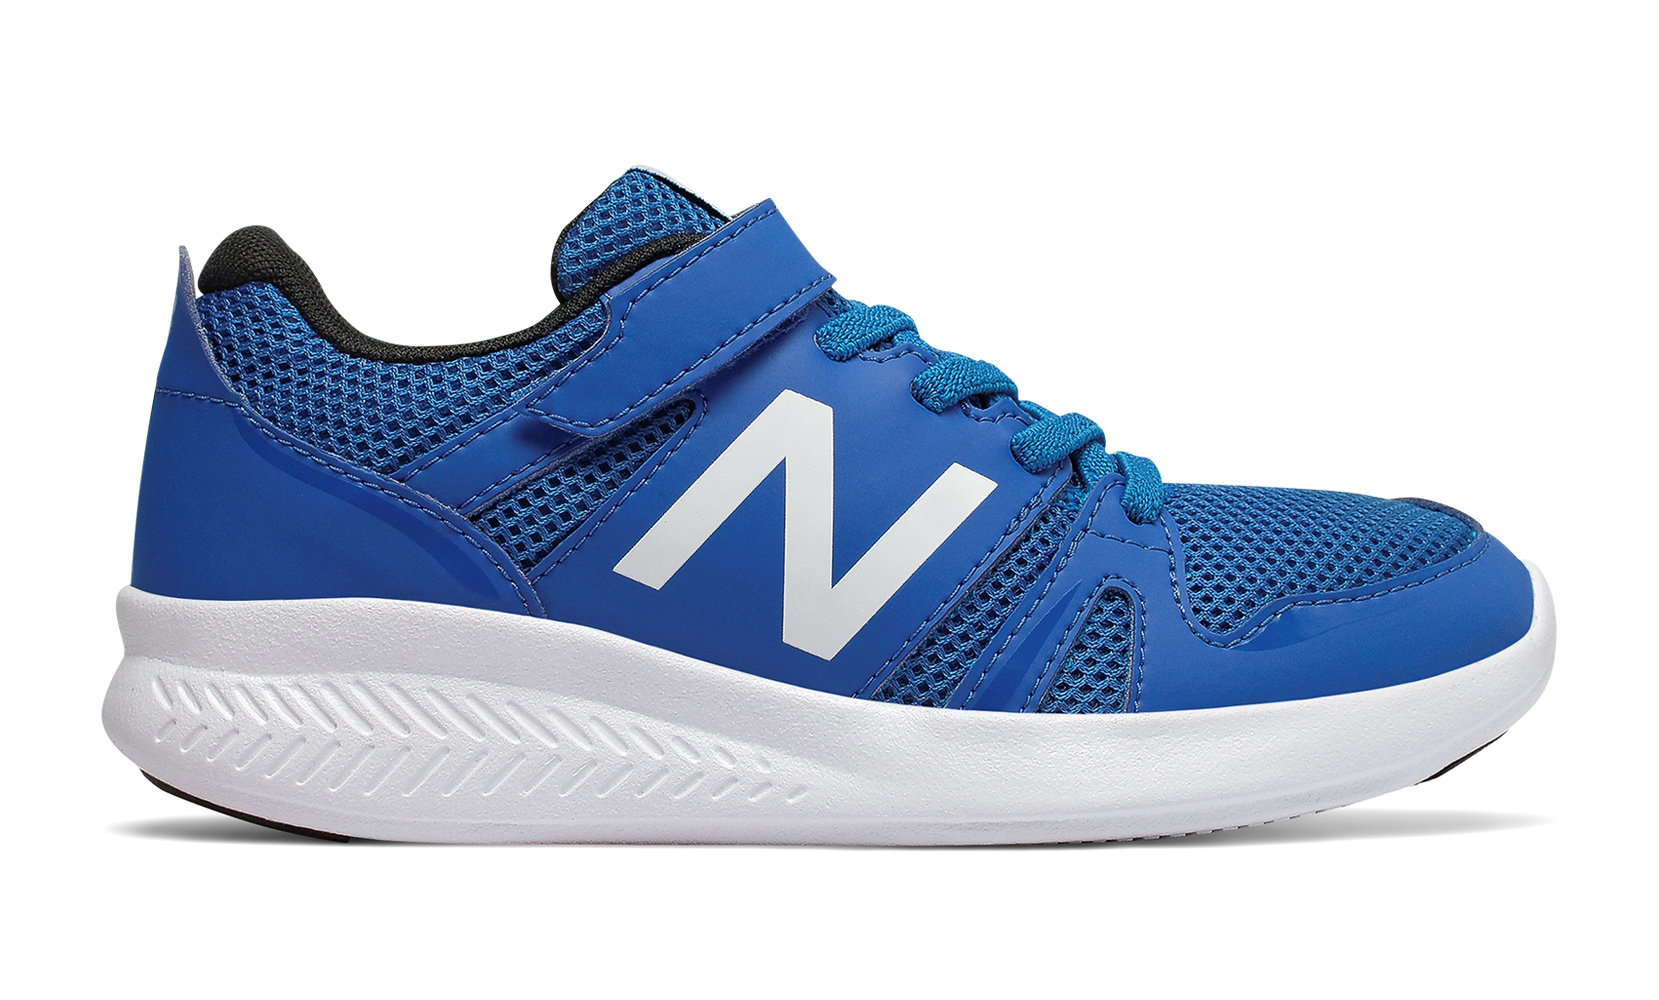 New Balance 570 YT570BL | New Balance